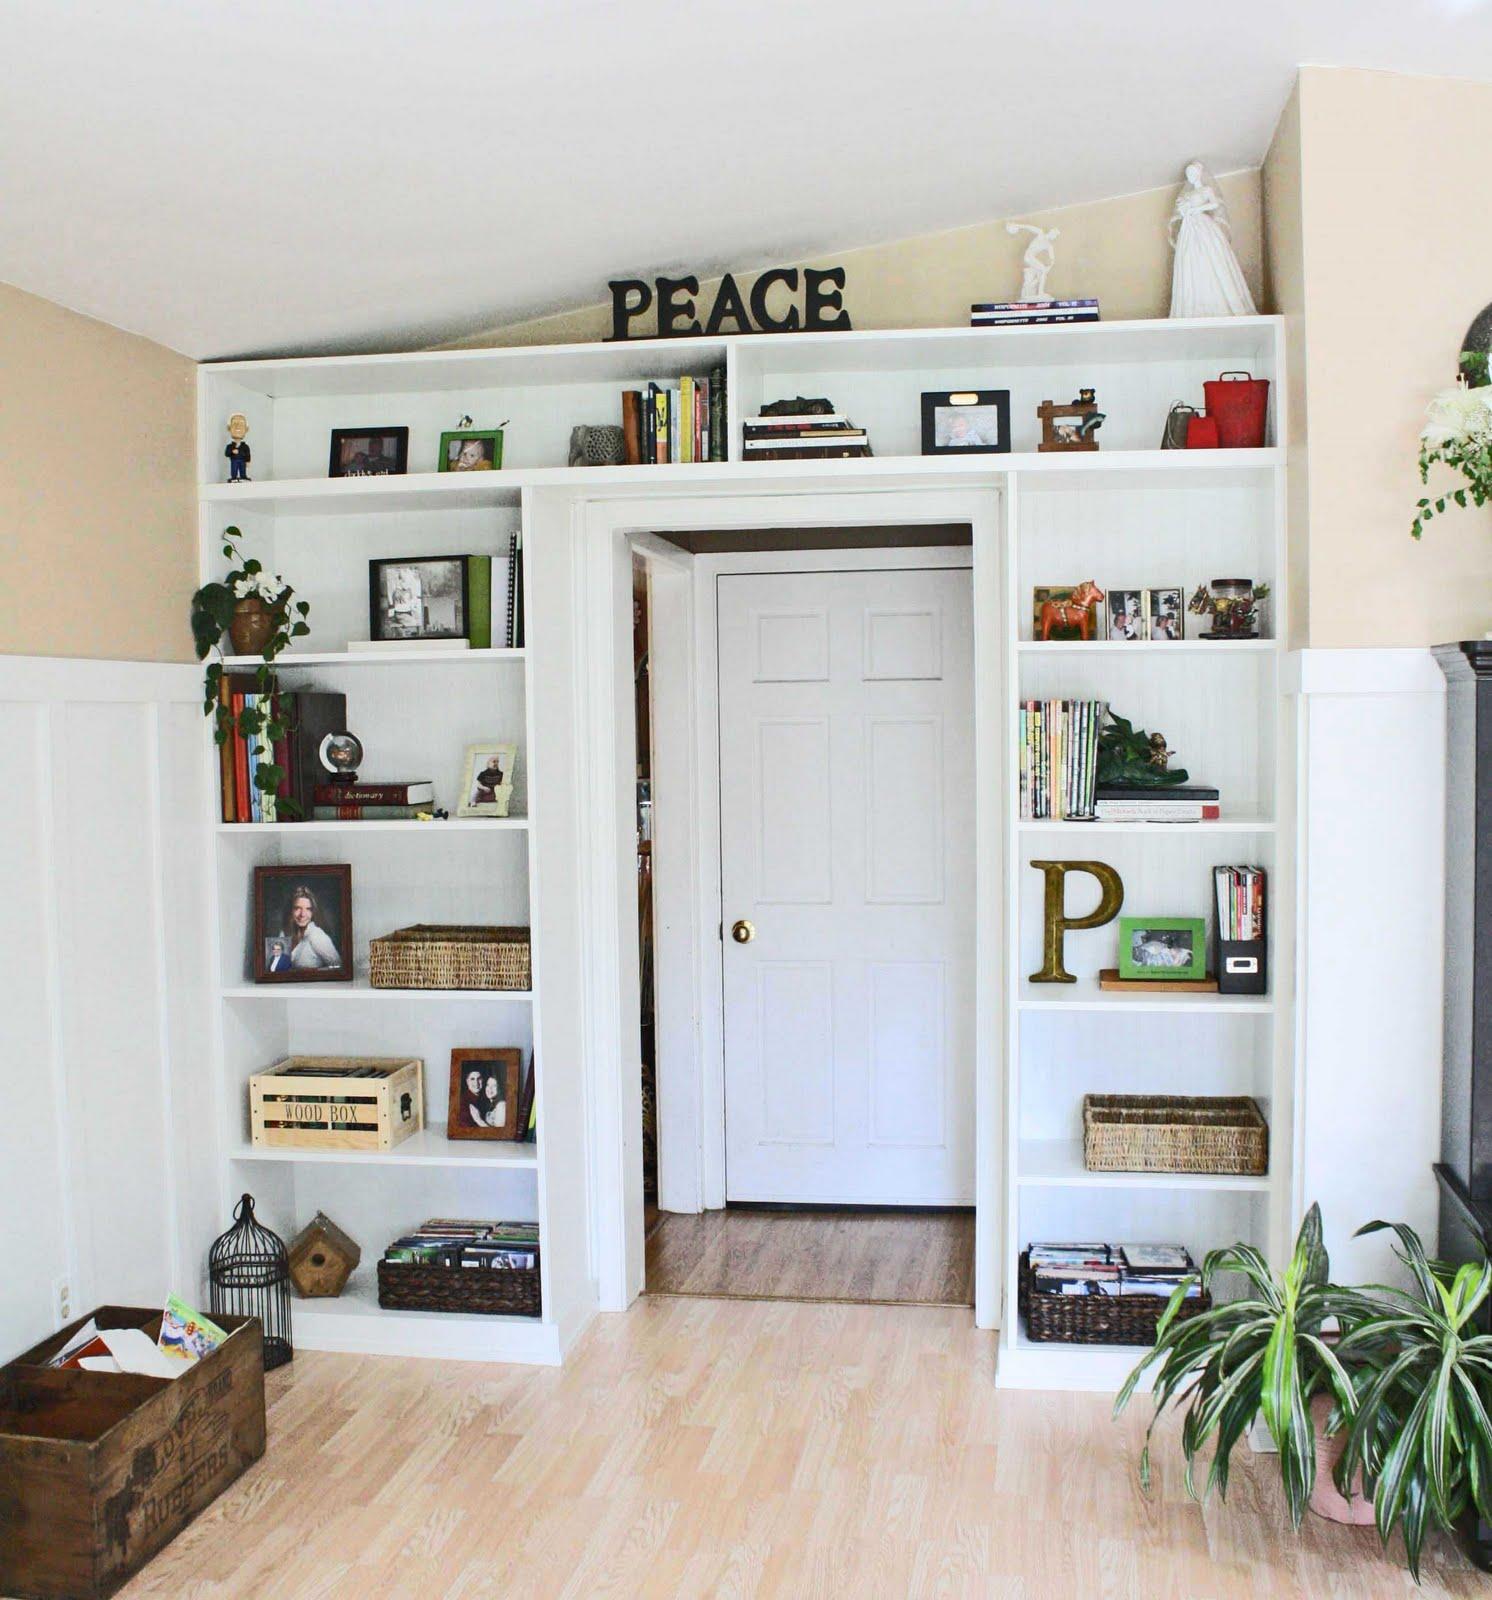 Living Room Built In Storage: = *Superwoman*=: Living Room Built-Ins